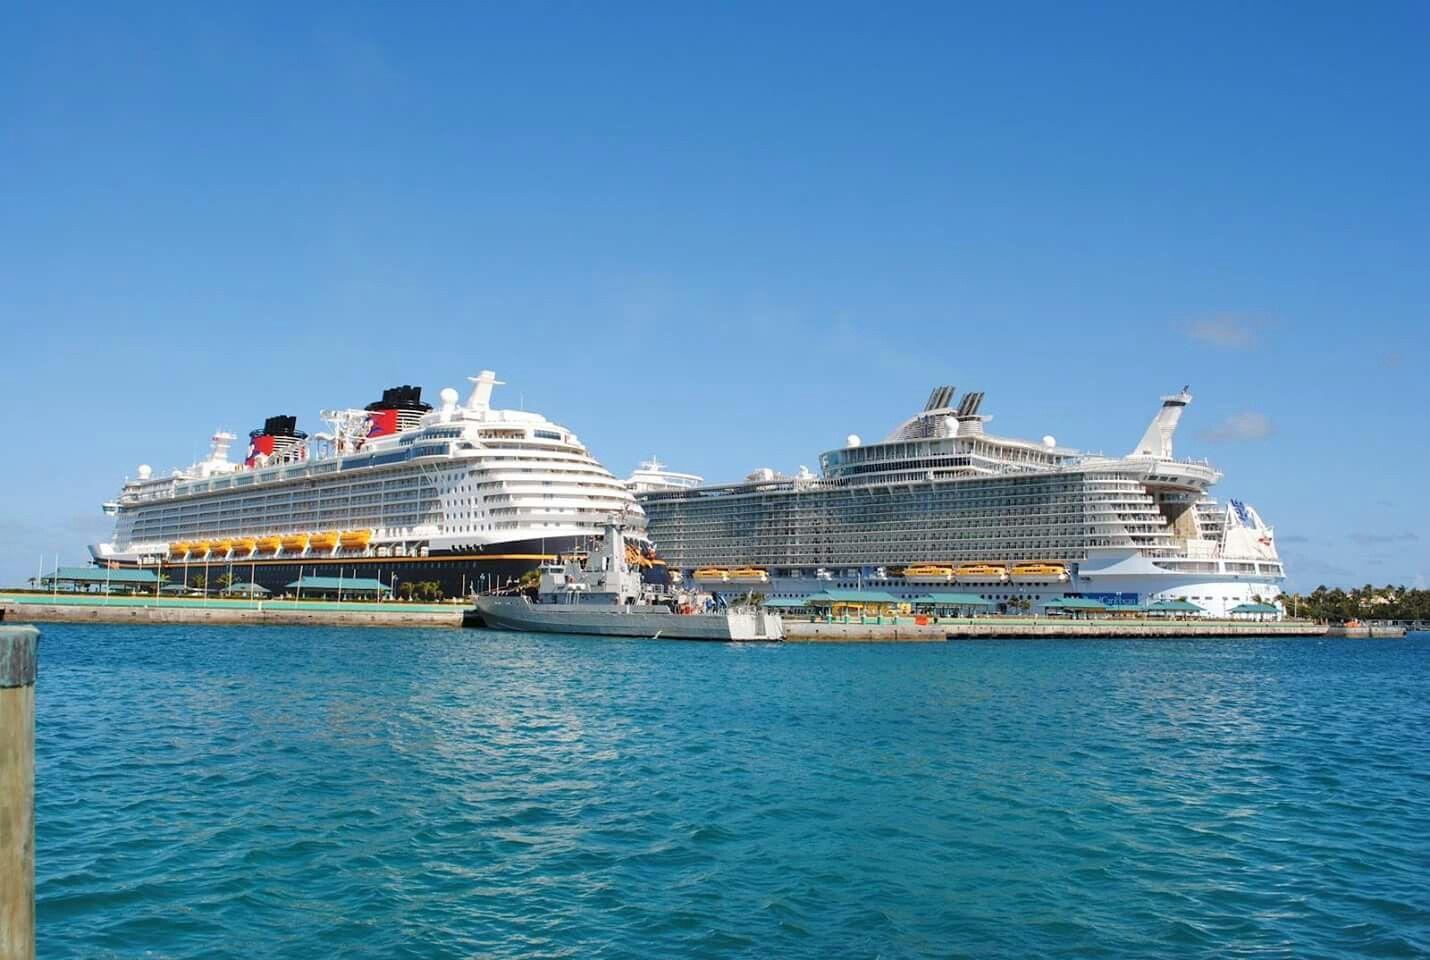 Pin By John DeBusi Jr On Cruiseships Pinterest - Discount disney cruises